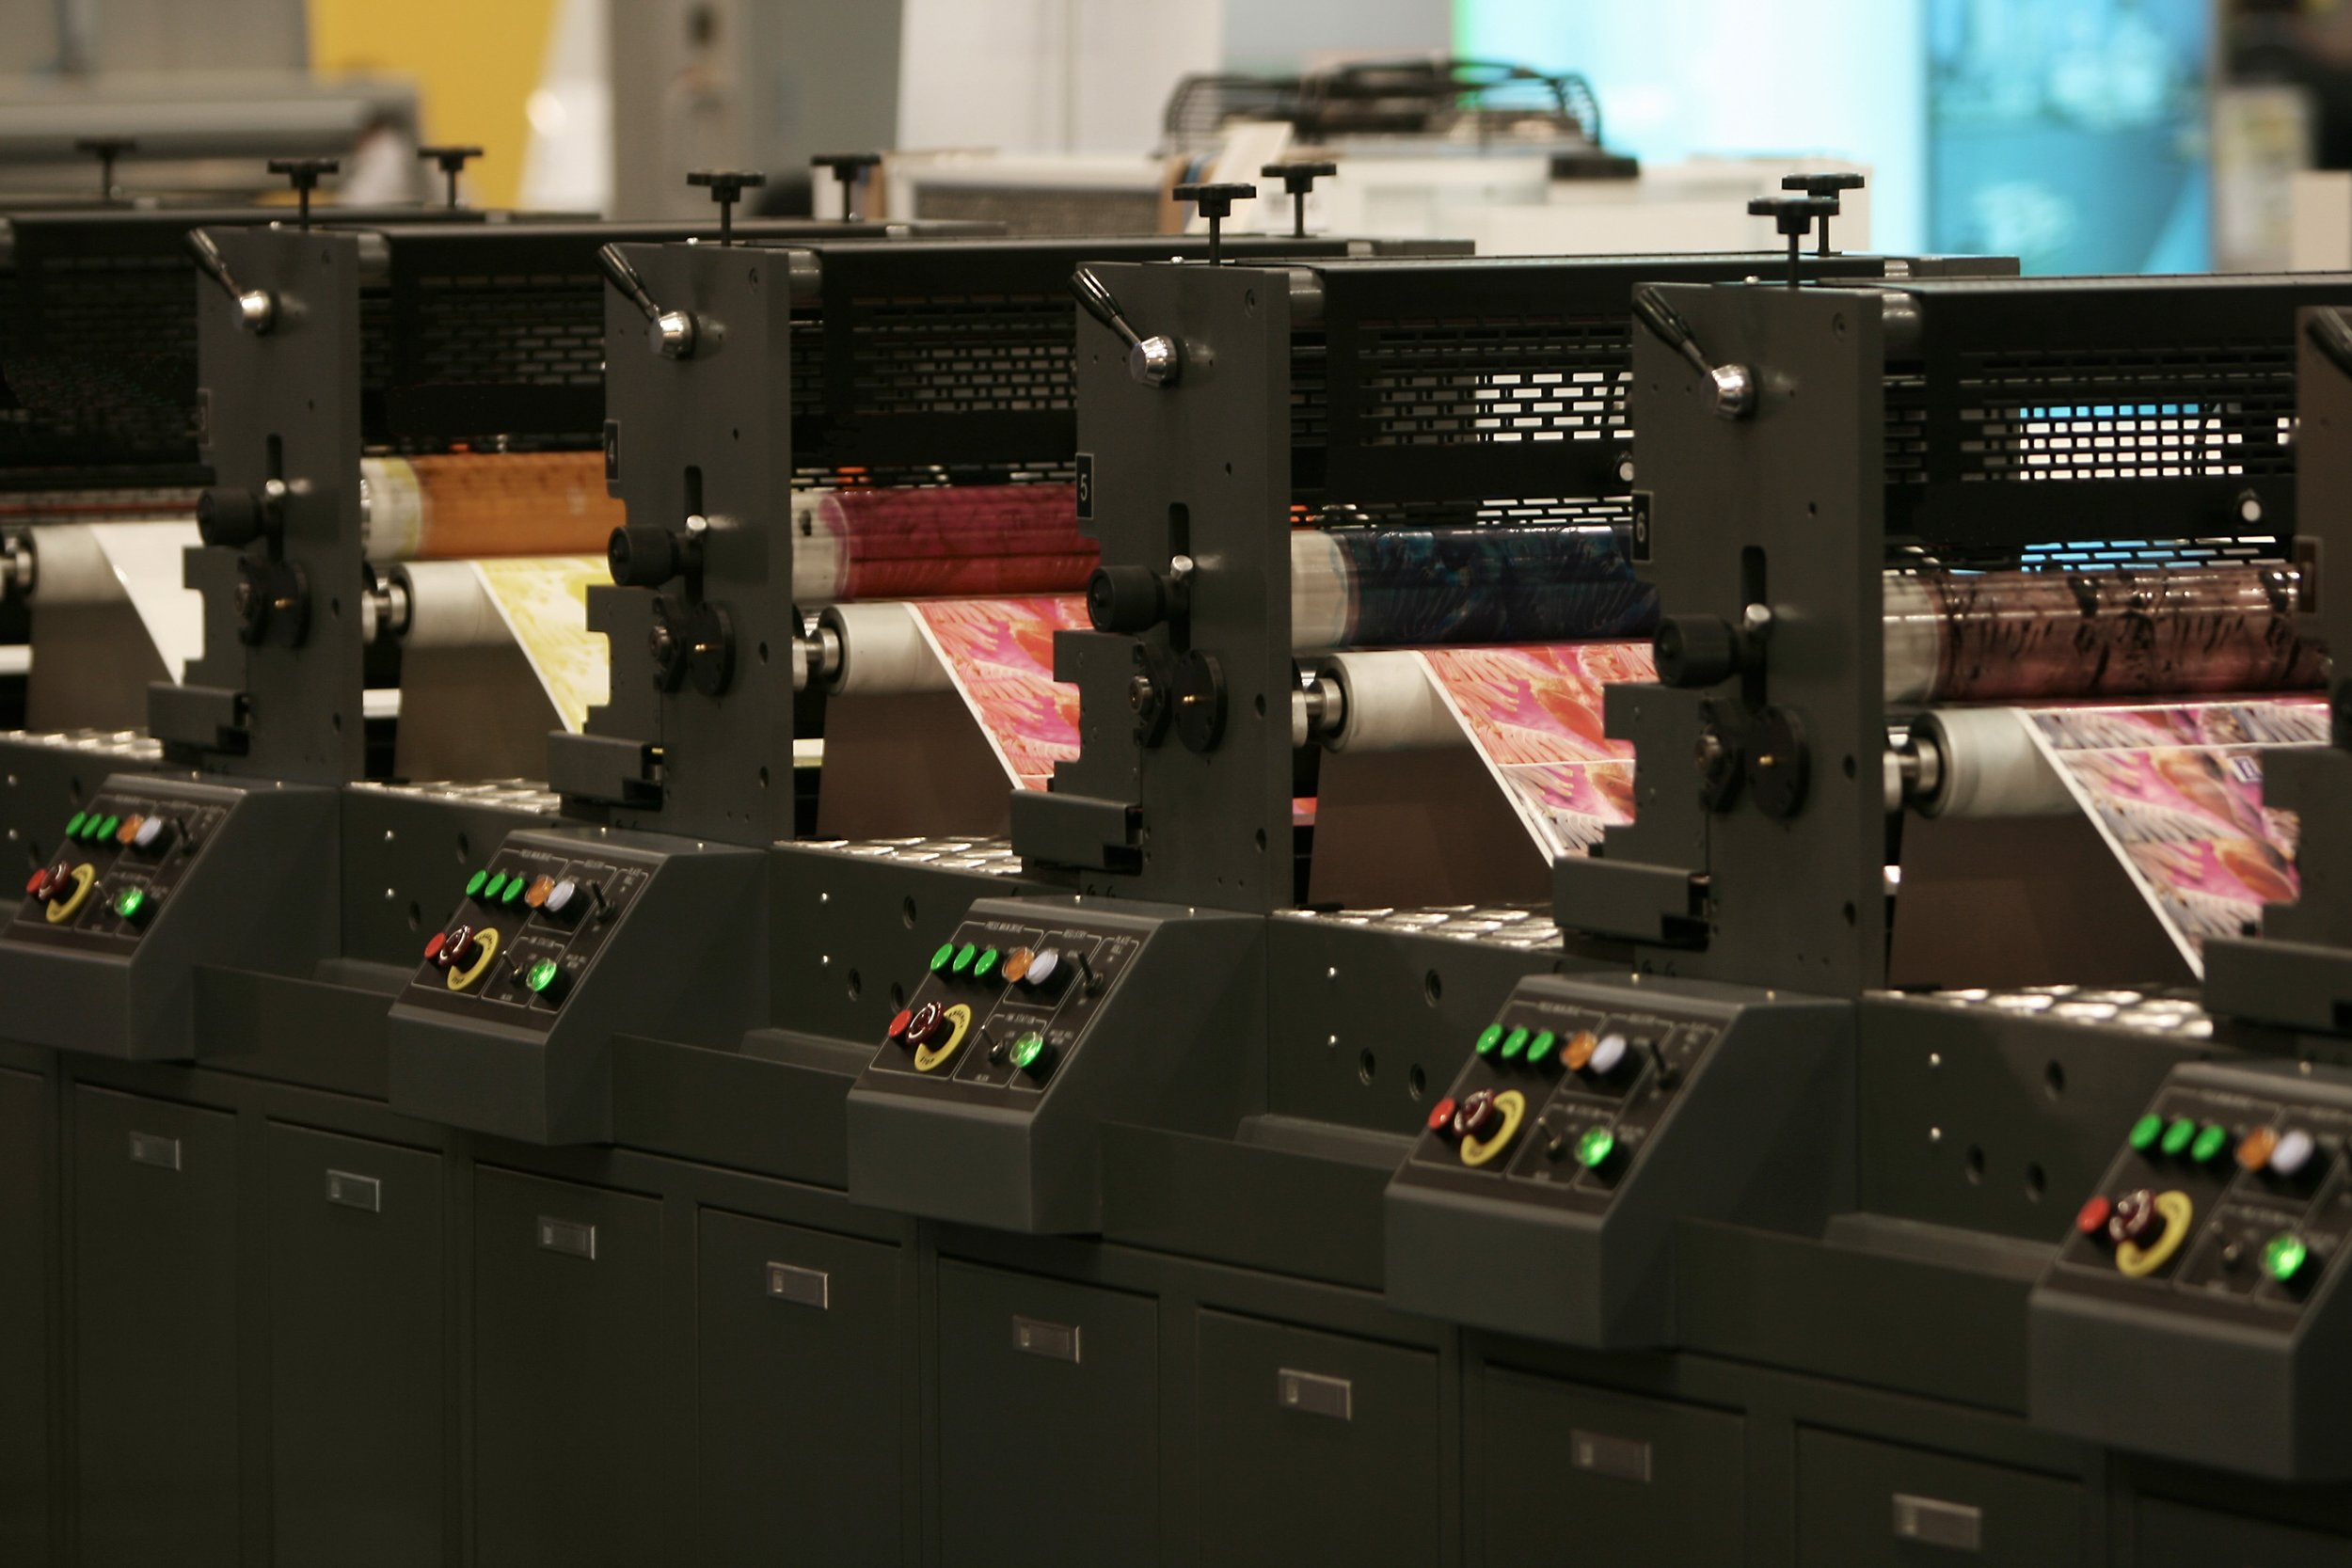 Lithographic Presses - 1 x Ryobi 755 B2 5 Colour with IR Drying 1 x Heidelberg Speedmaster CD B1